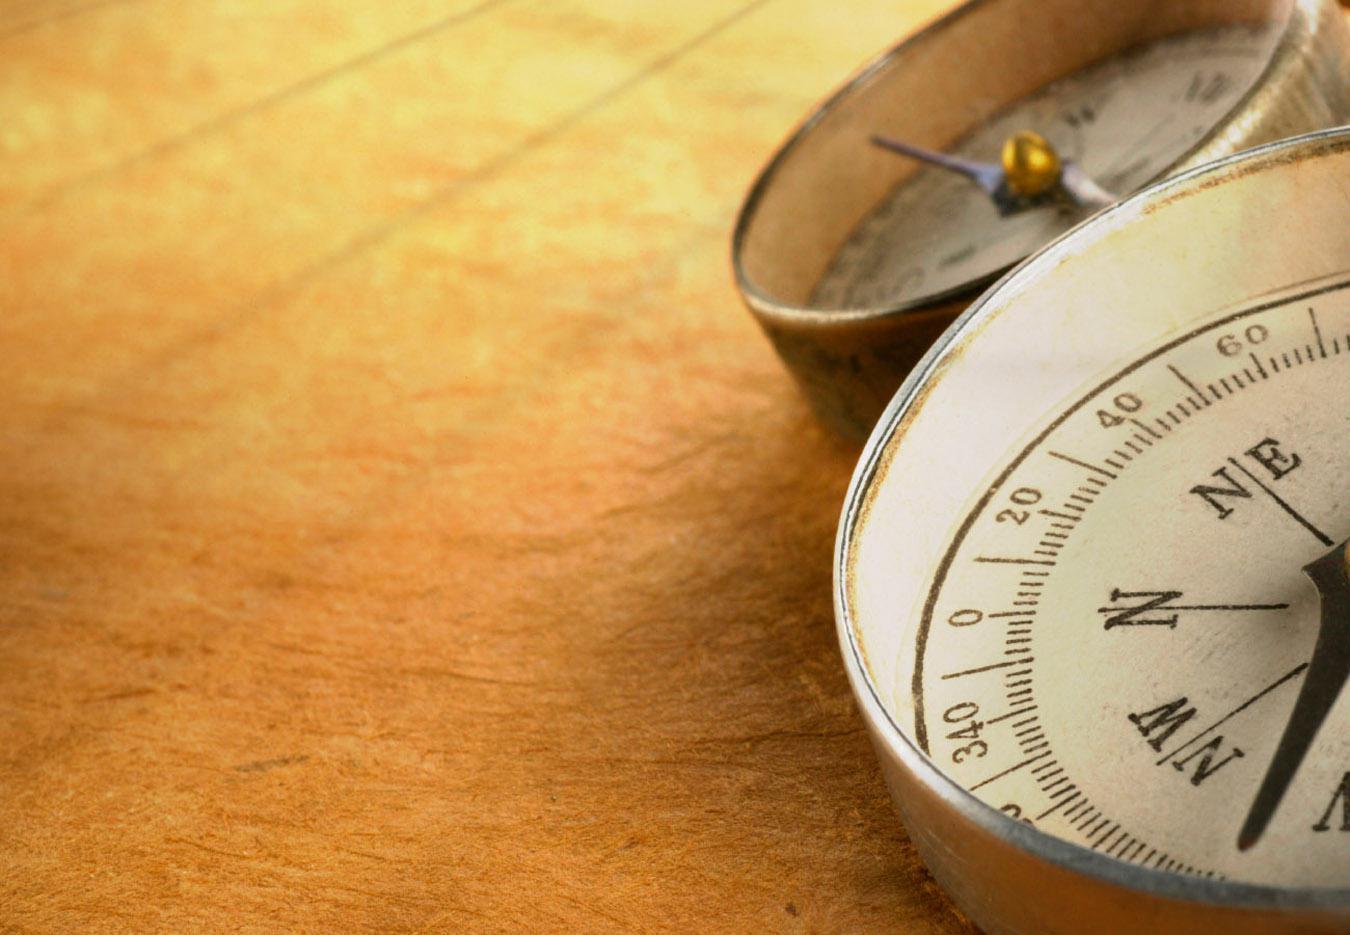 Compass Wallpapers   Top Compass Backgrounds   WallpaperAccess 1350x935